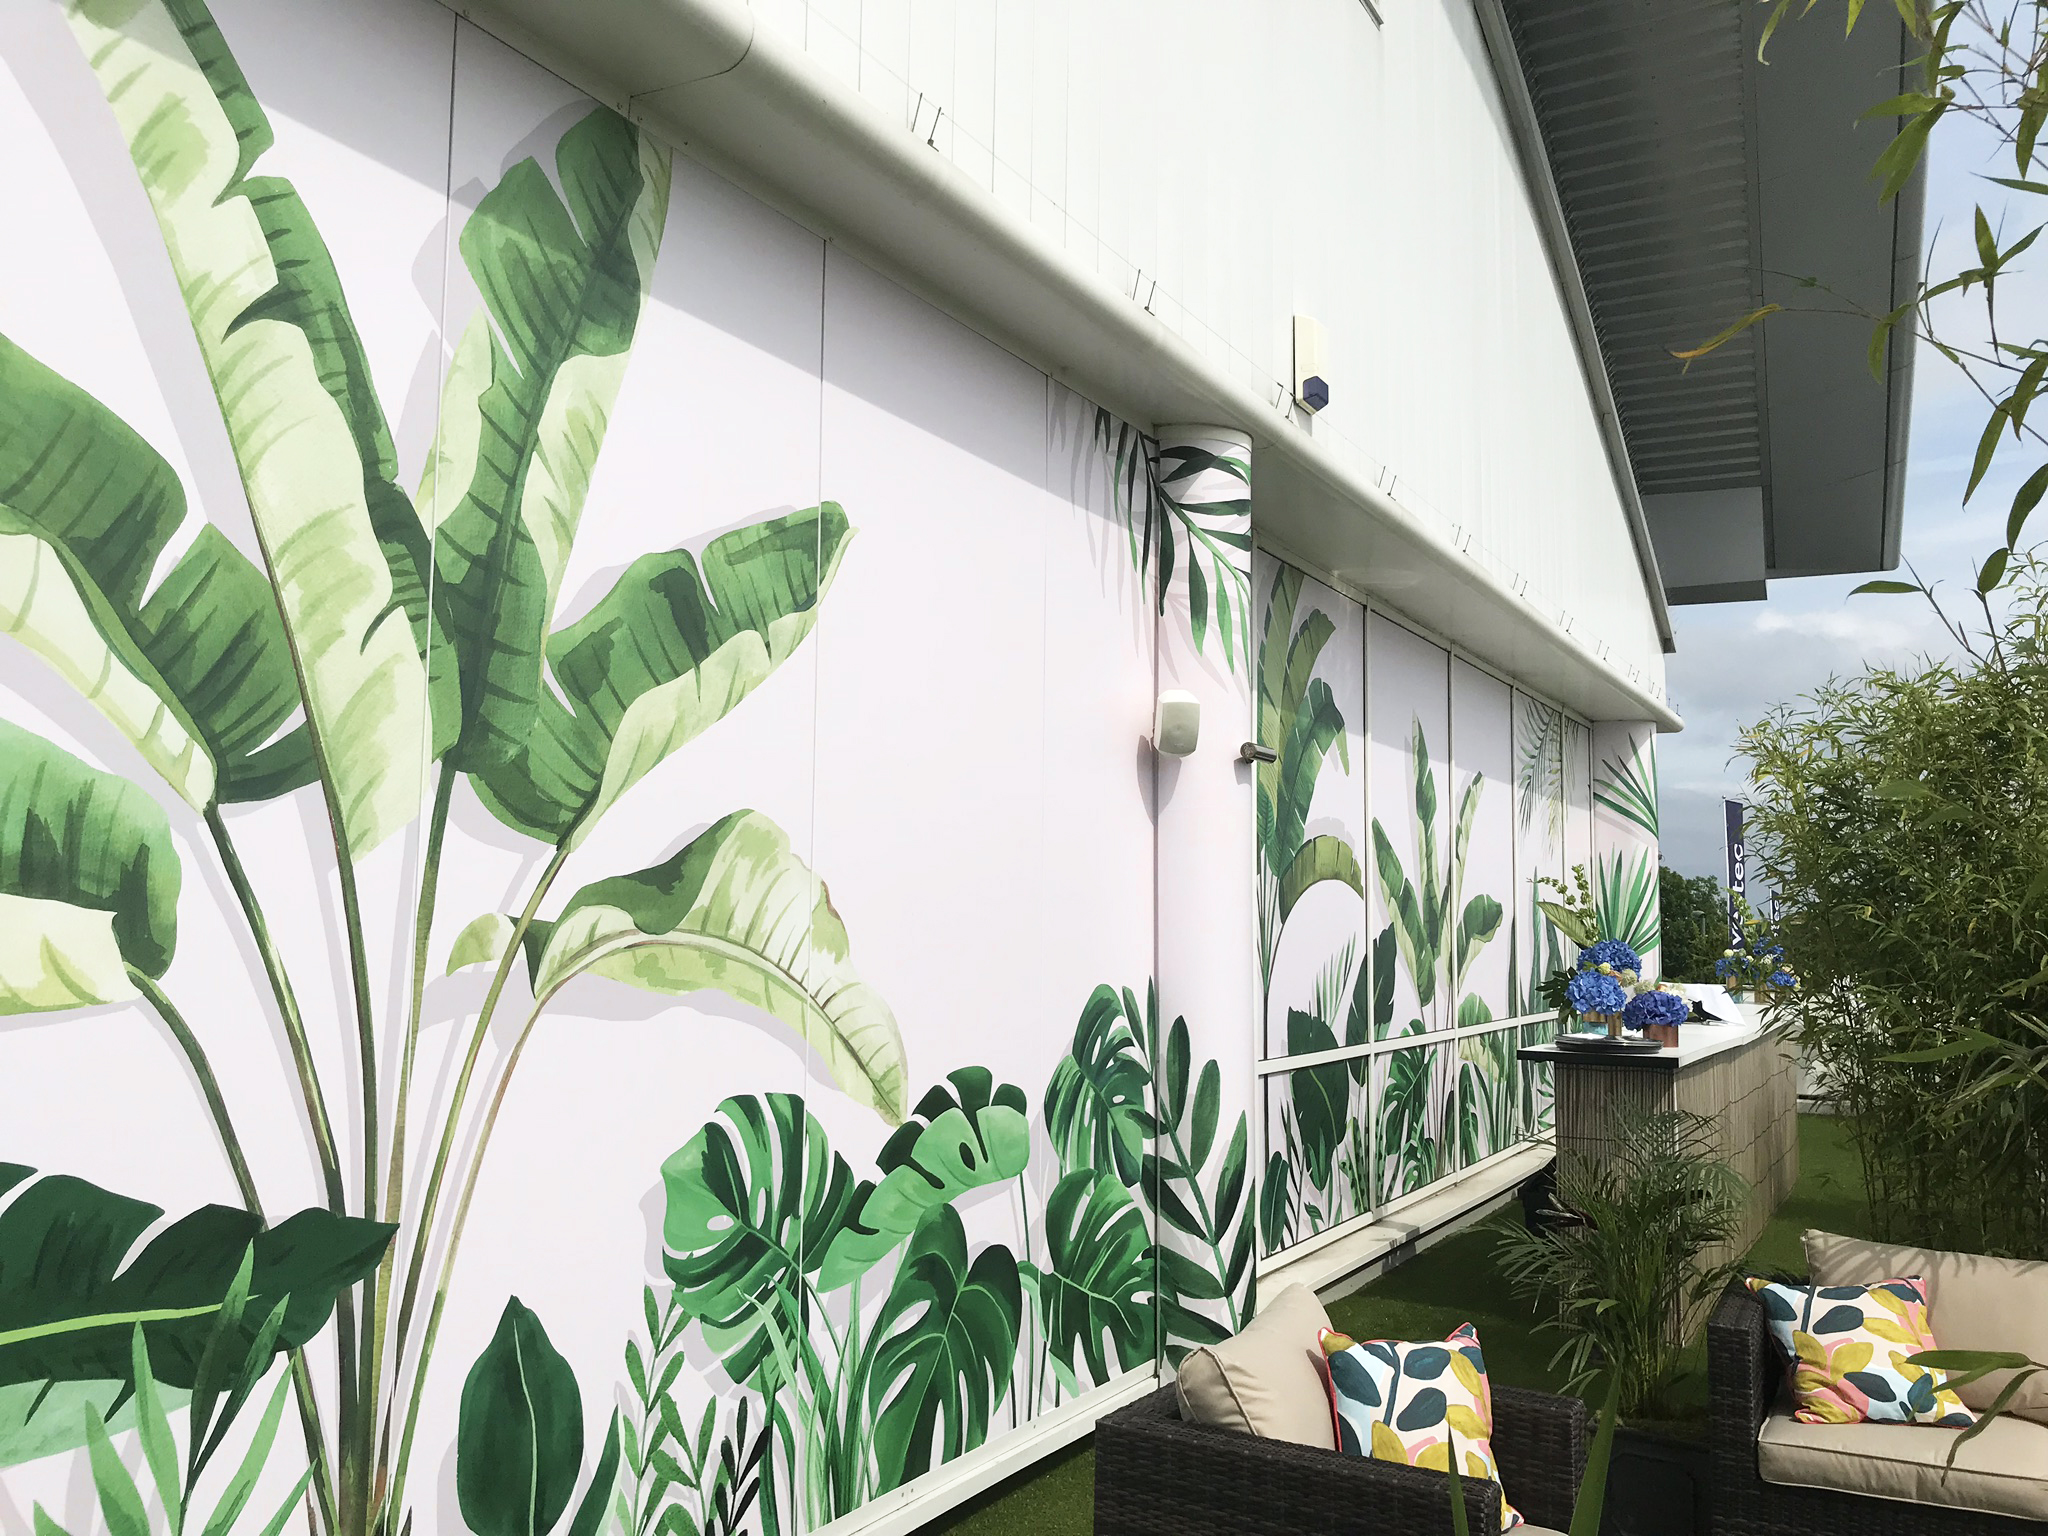 Investec Derby Mural by Bella Gomez